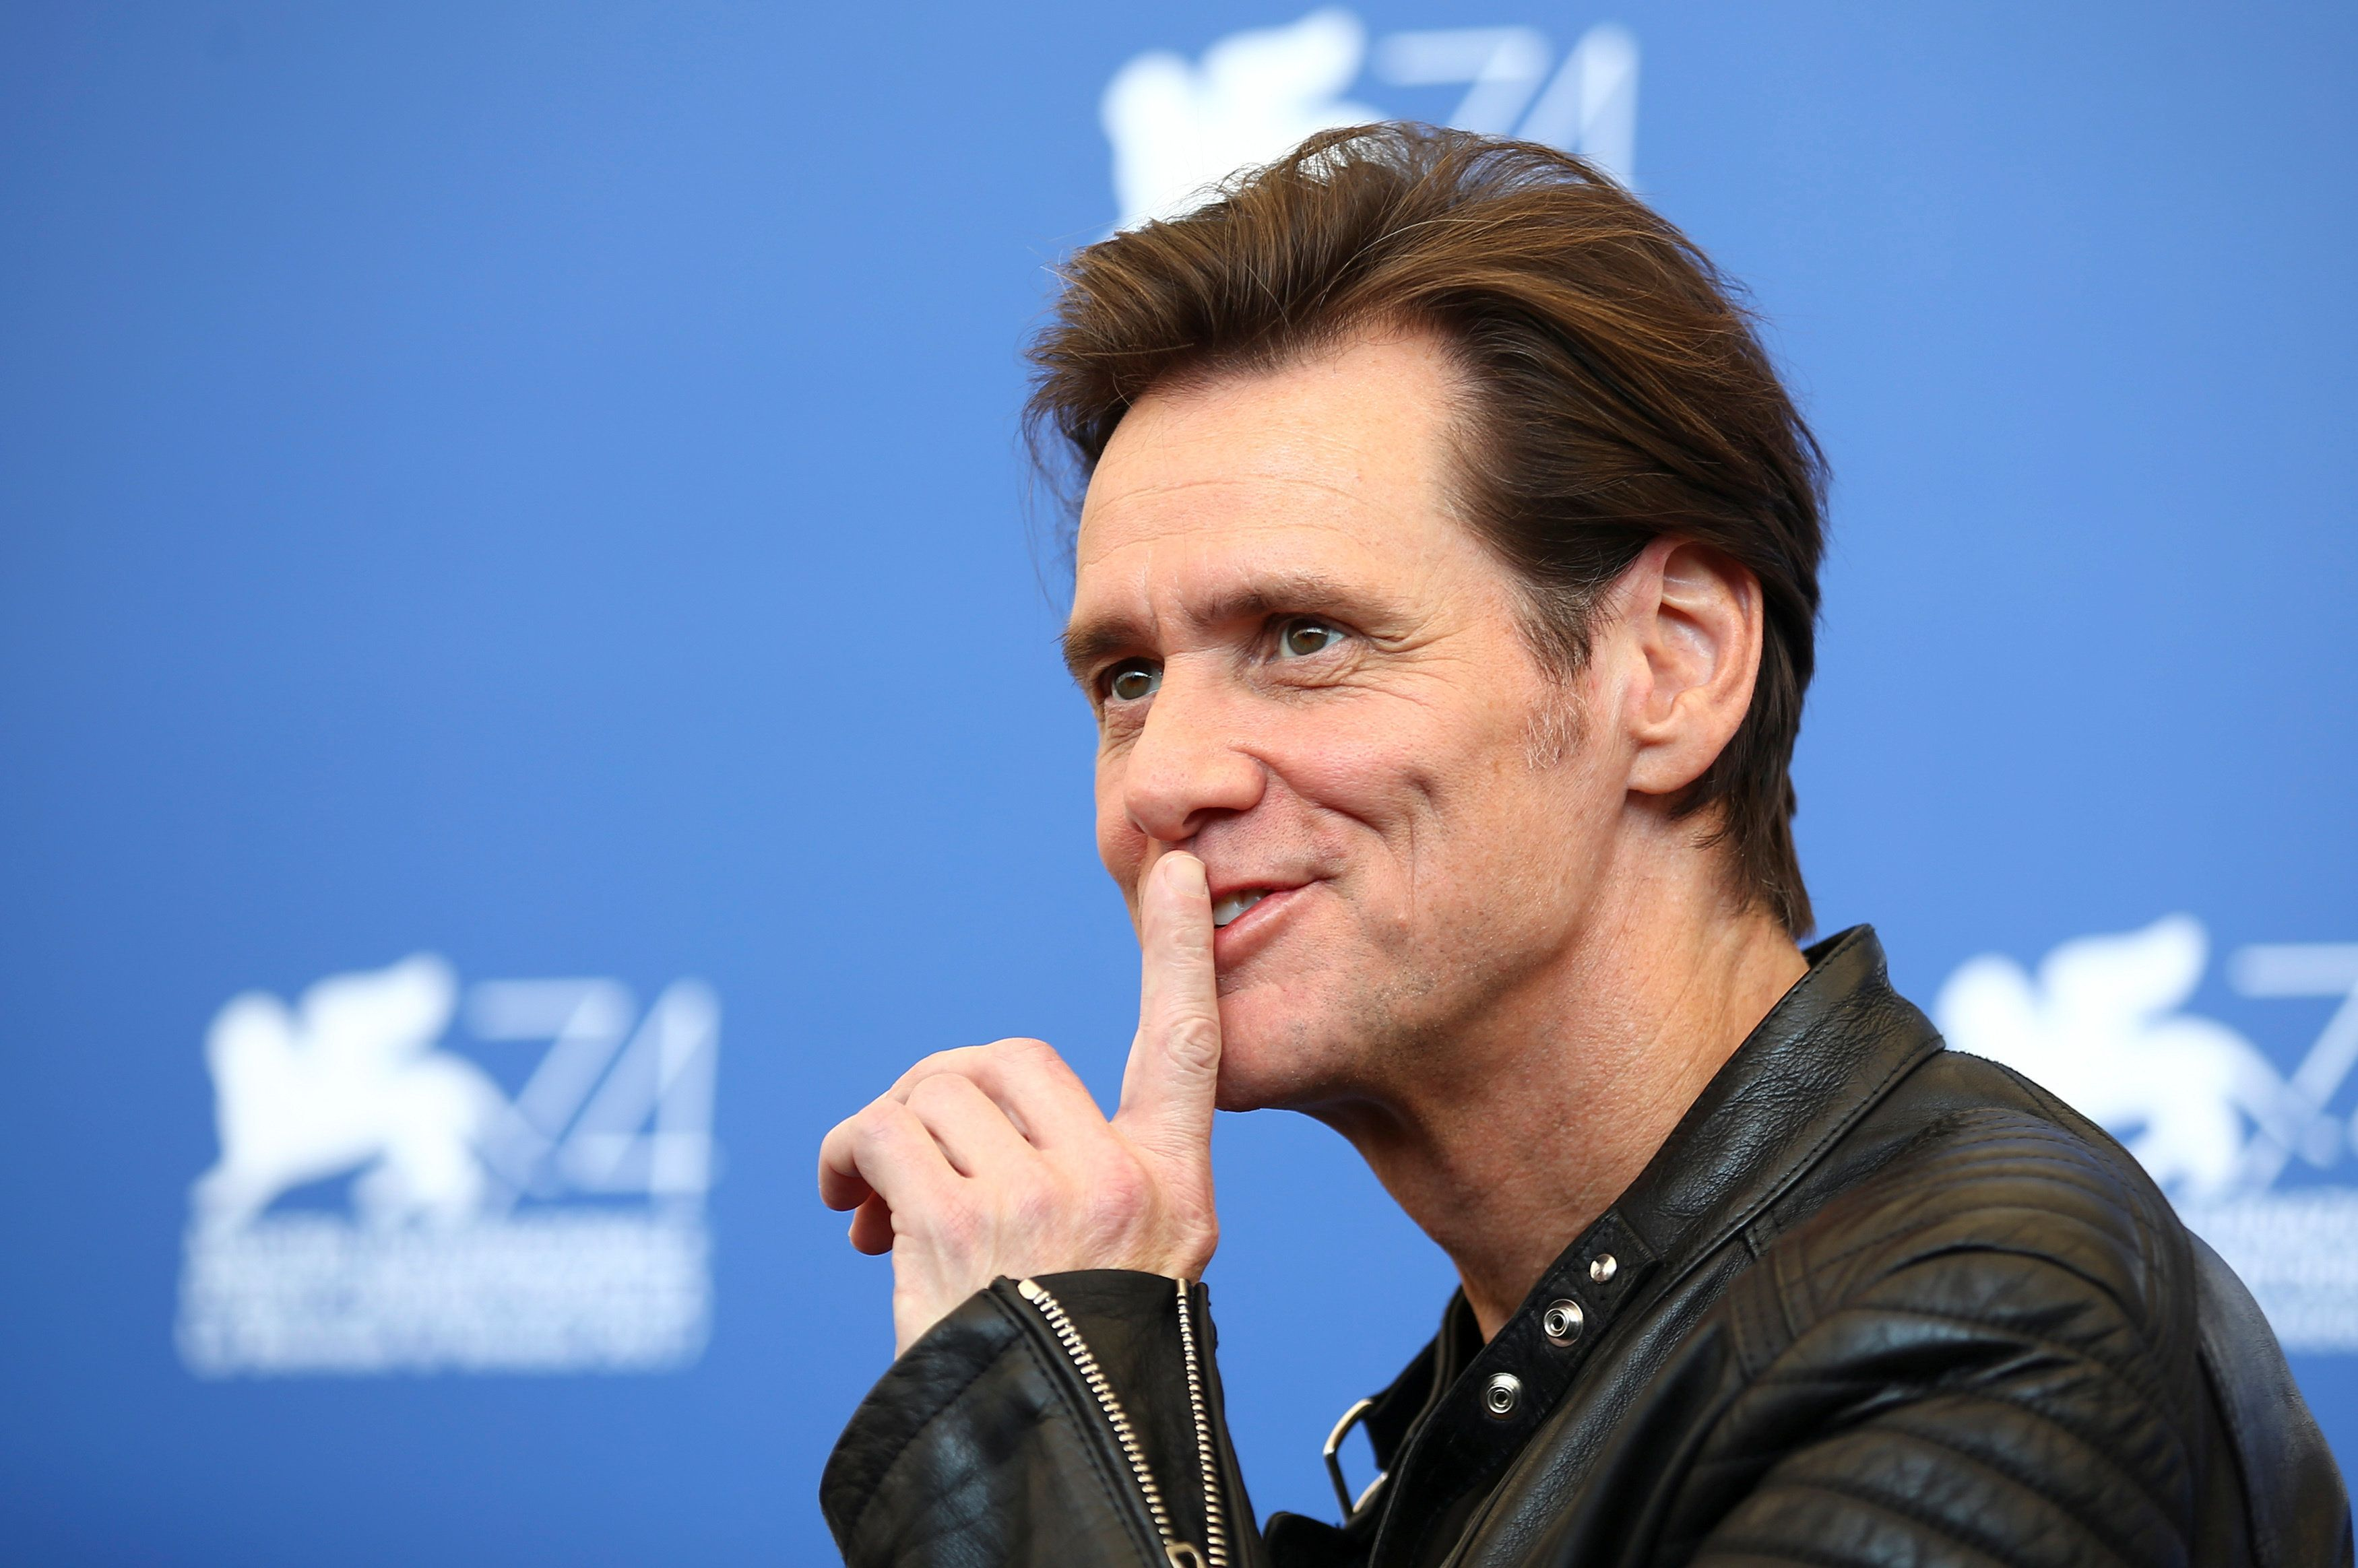 Donald Trump May Actually Enjoy Jim Carrey's Latest Biting Political Portrait